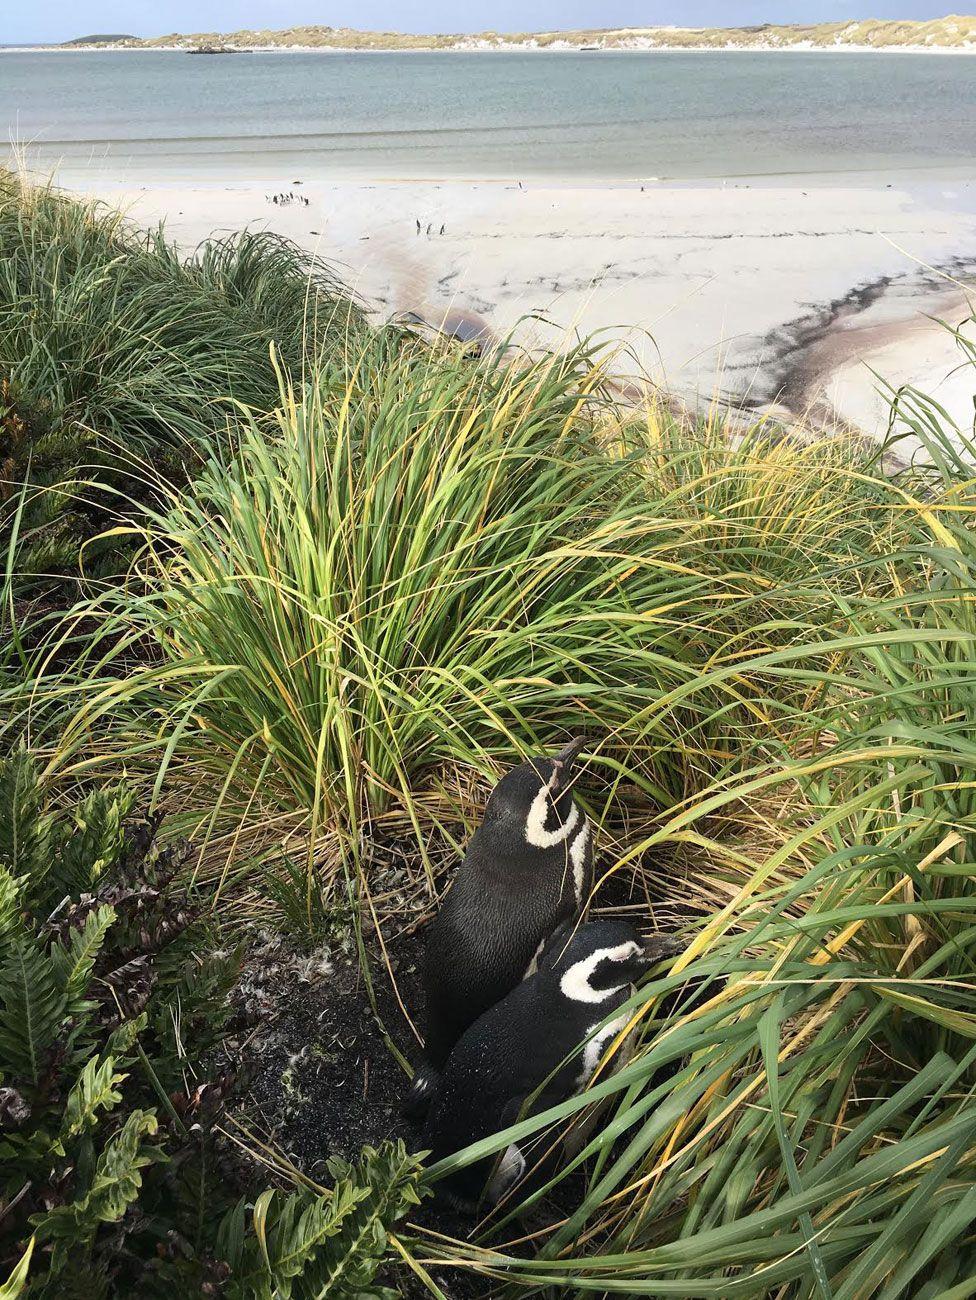 Magellanic penguins at Yorke Bay